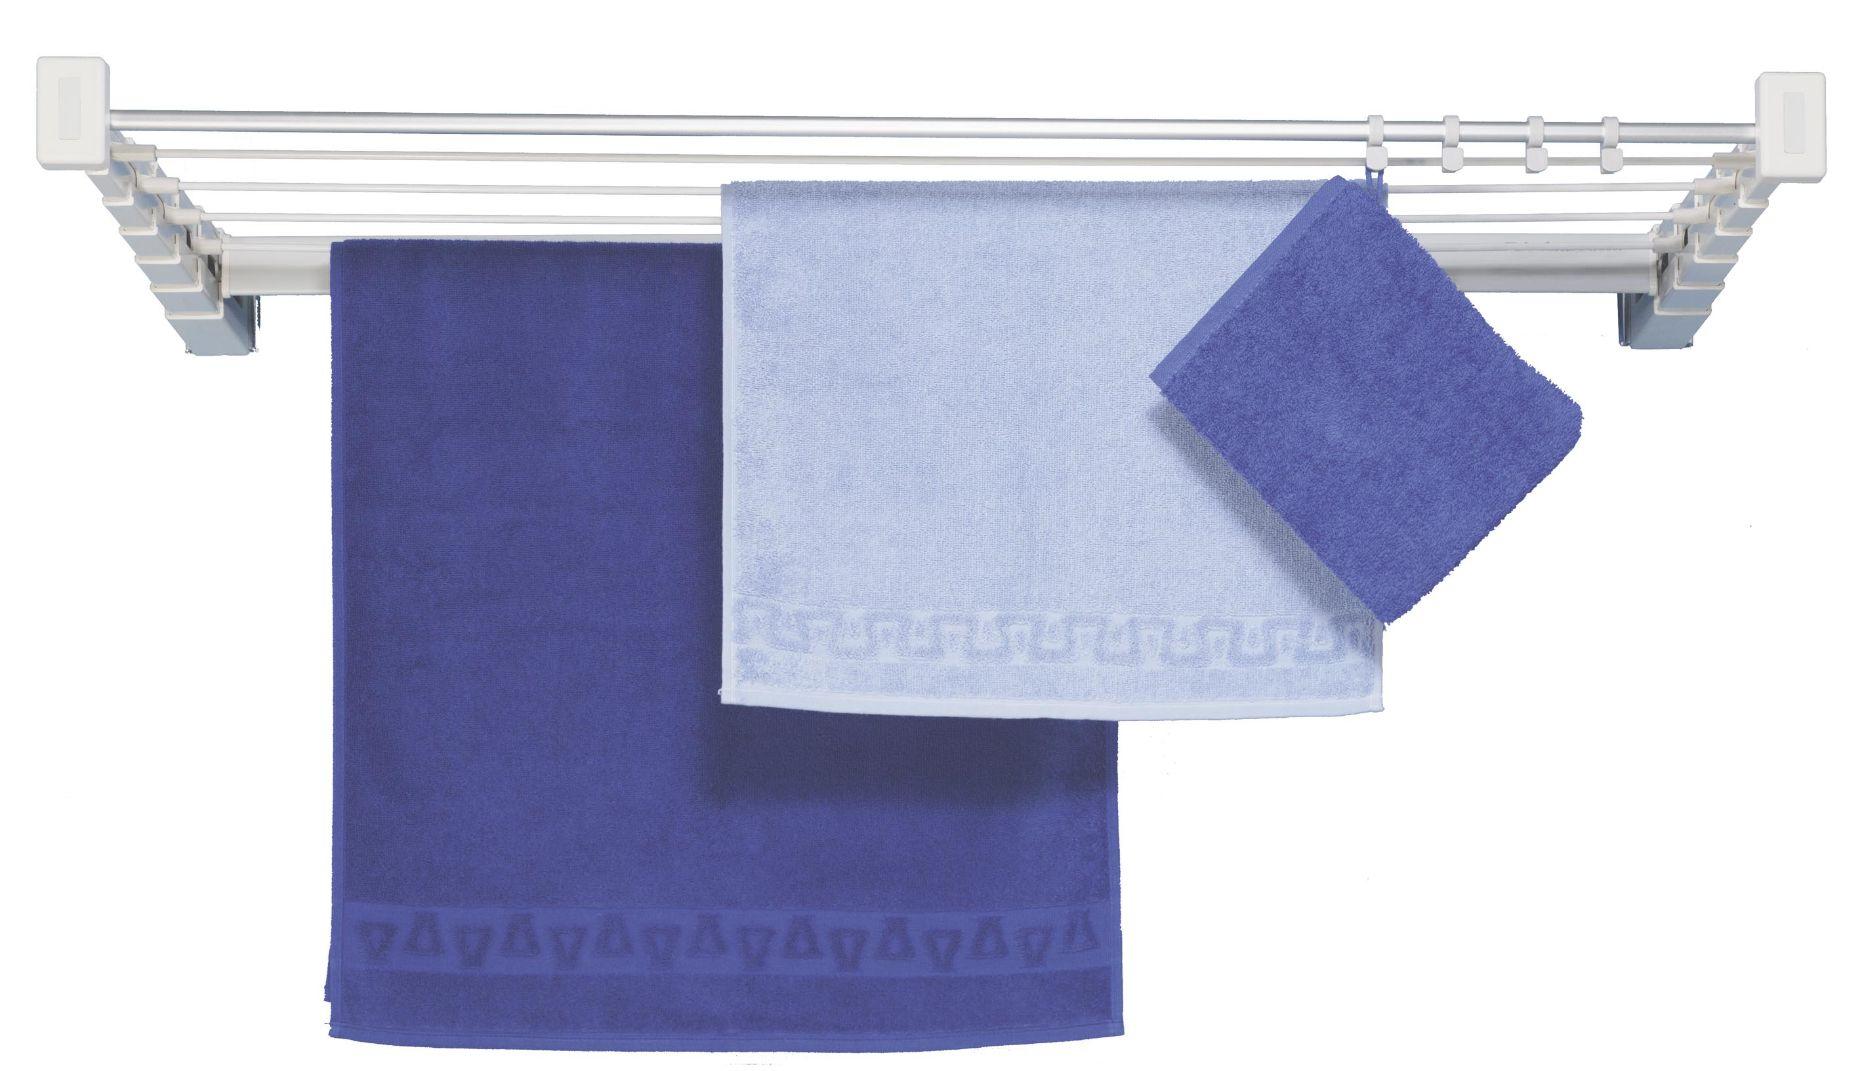 Clothes Drying Racks Laundry Drying Racks Clotheslinescom